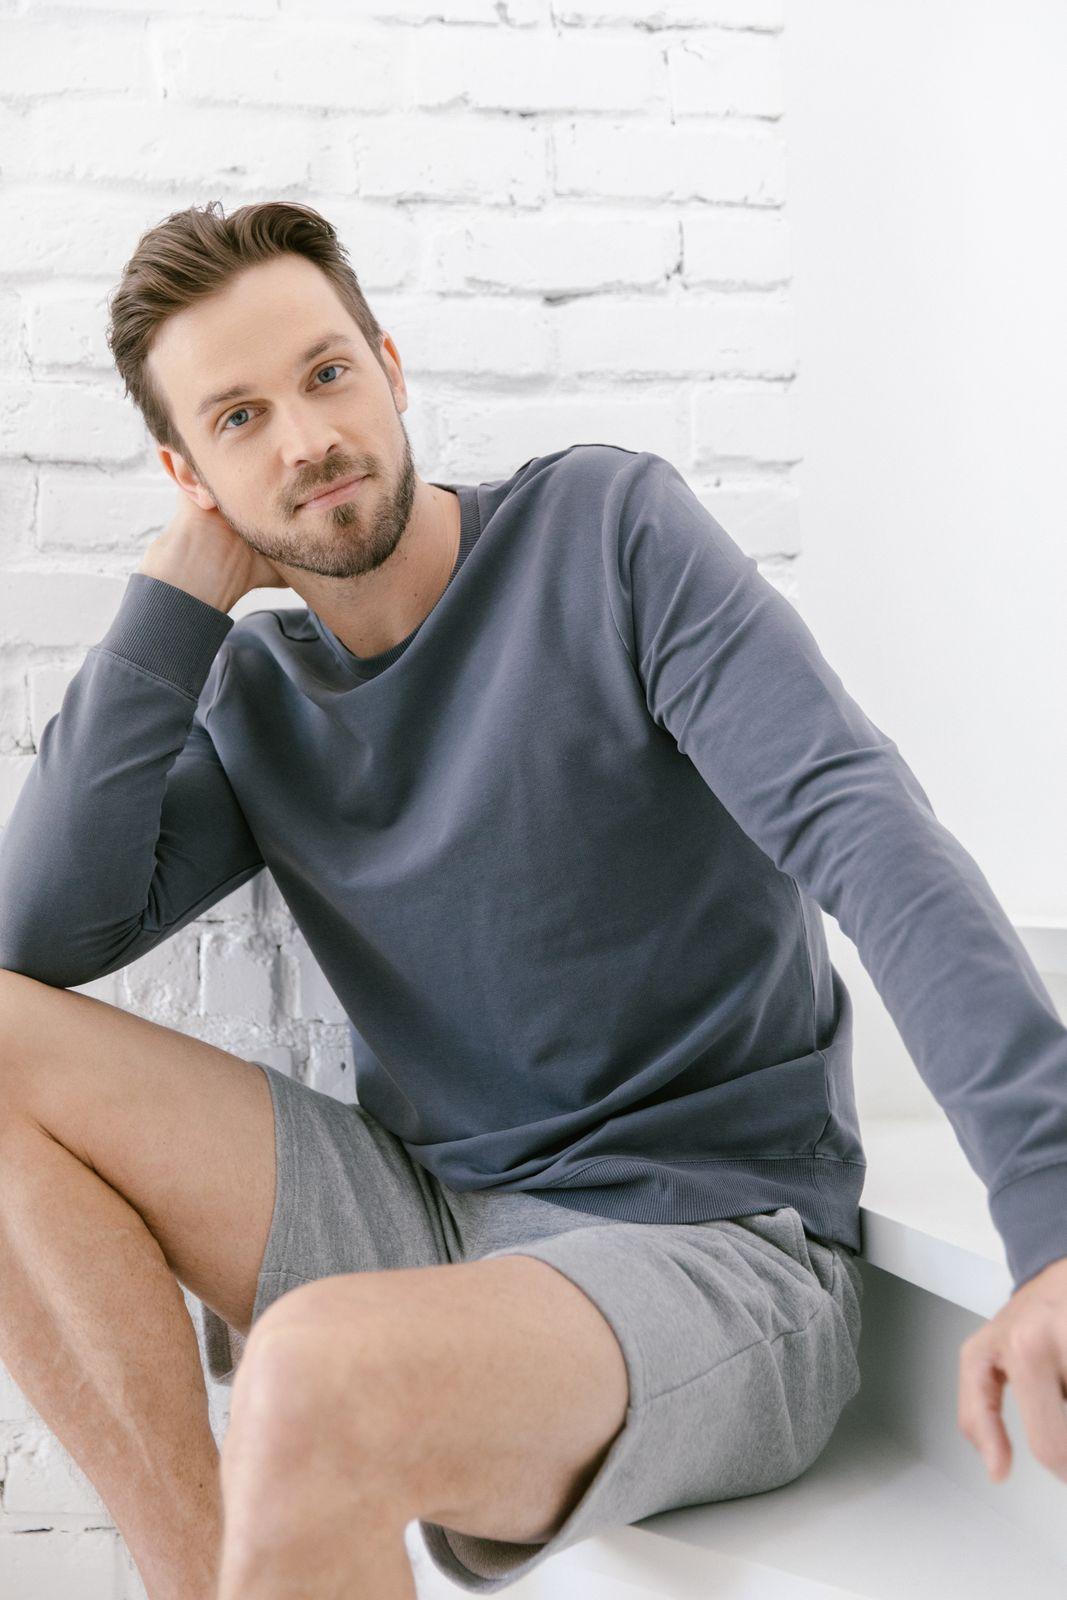 man in comfy clothes